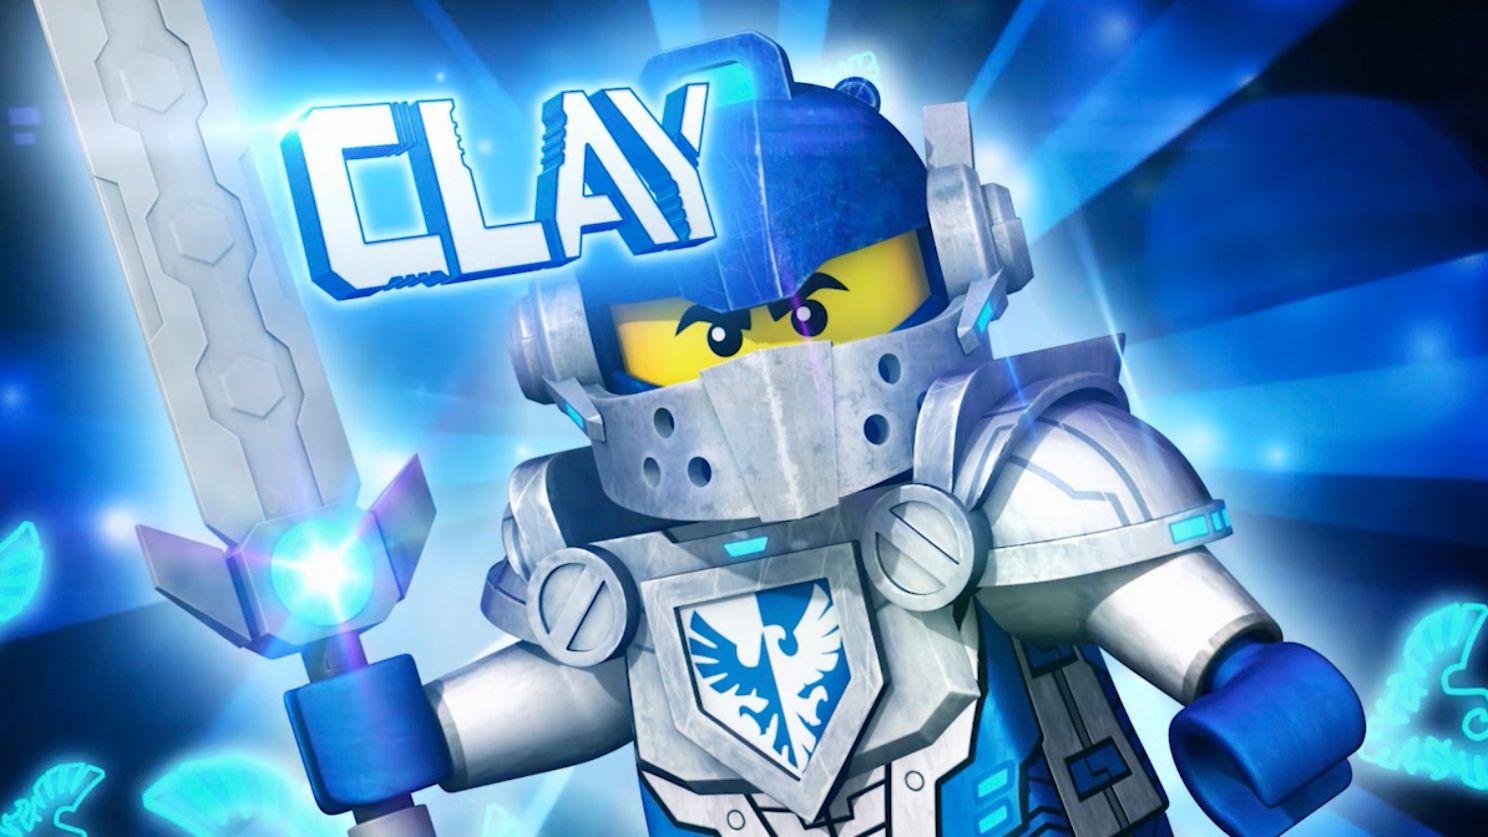 KnightsLego KnightsLego Nexo Clay Characters Clay KnightsLego Nexo Nexo Clay Characters Characters 3q4jLc5ARS